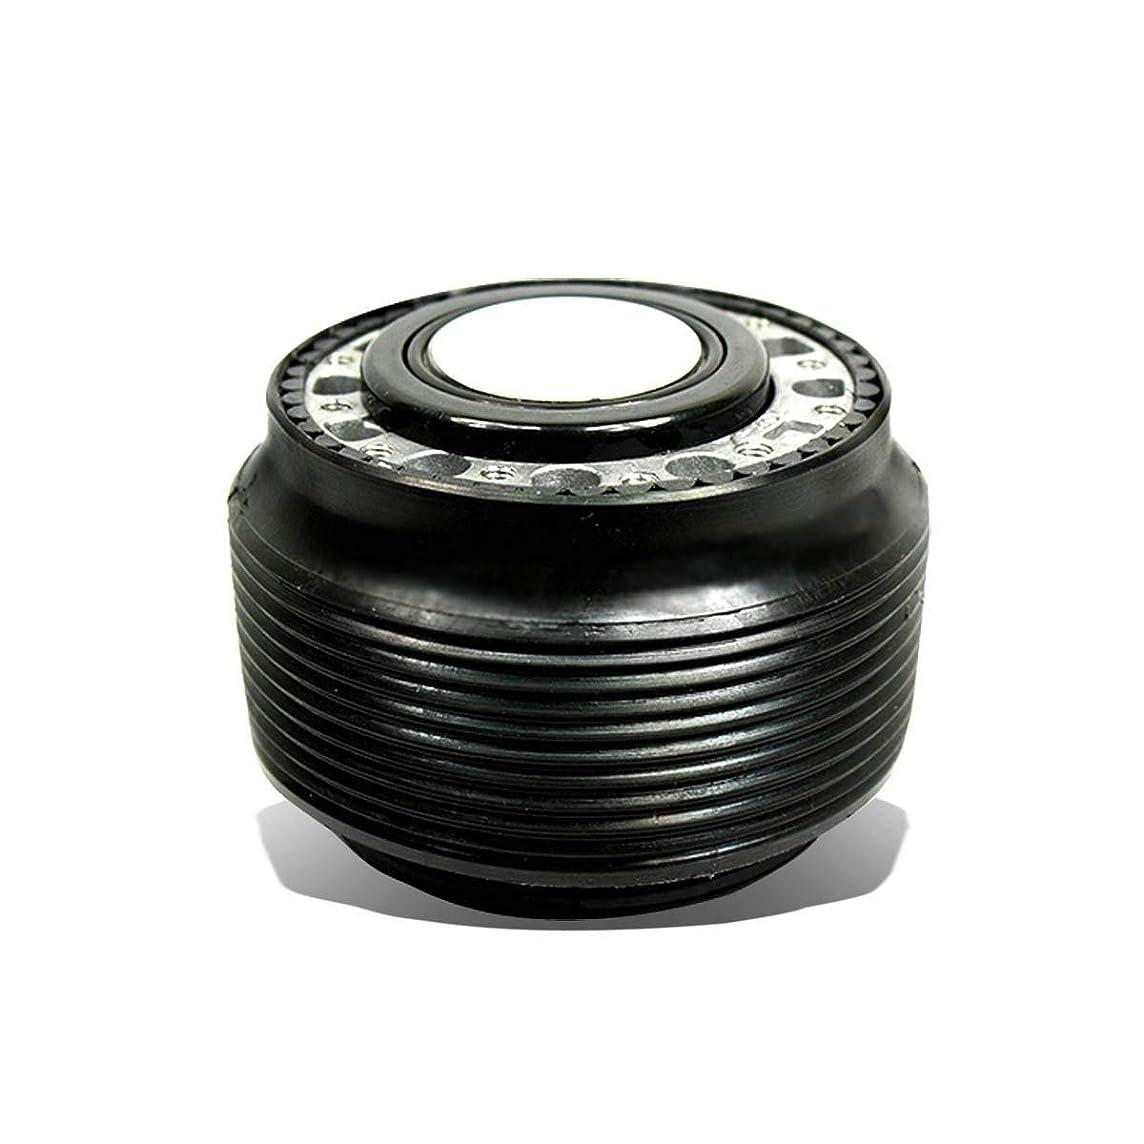 For Mazda Miata/RX7/RX8/626/Protege Steering Wheel 6-Hole Hub Adapter Kit - MX-5 NA NB NC